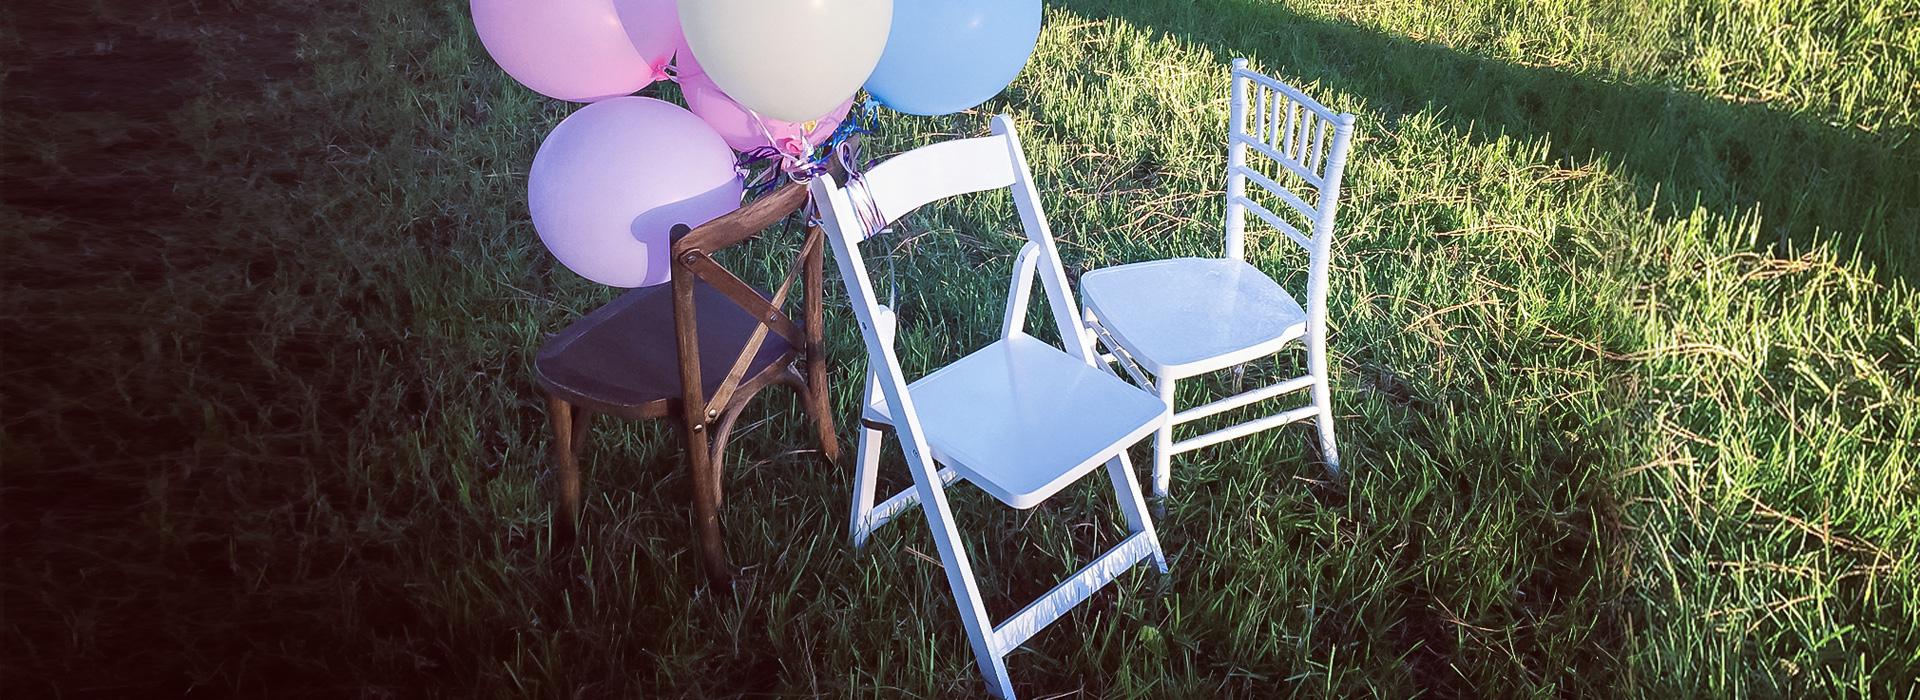 Super Childrens Chair Richwood Imports Machost Co Dining Chair Design Ideas Machostcouk